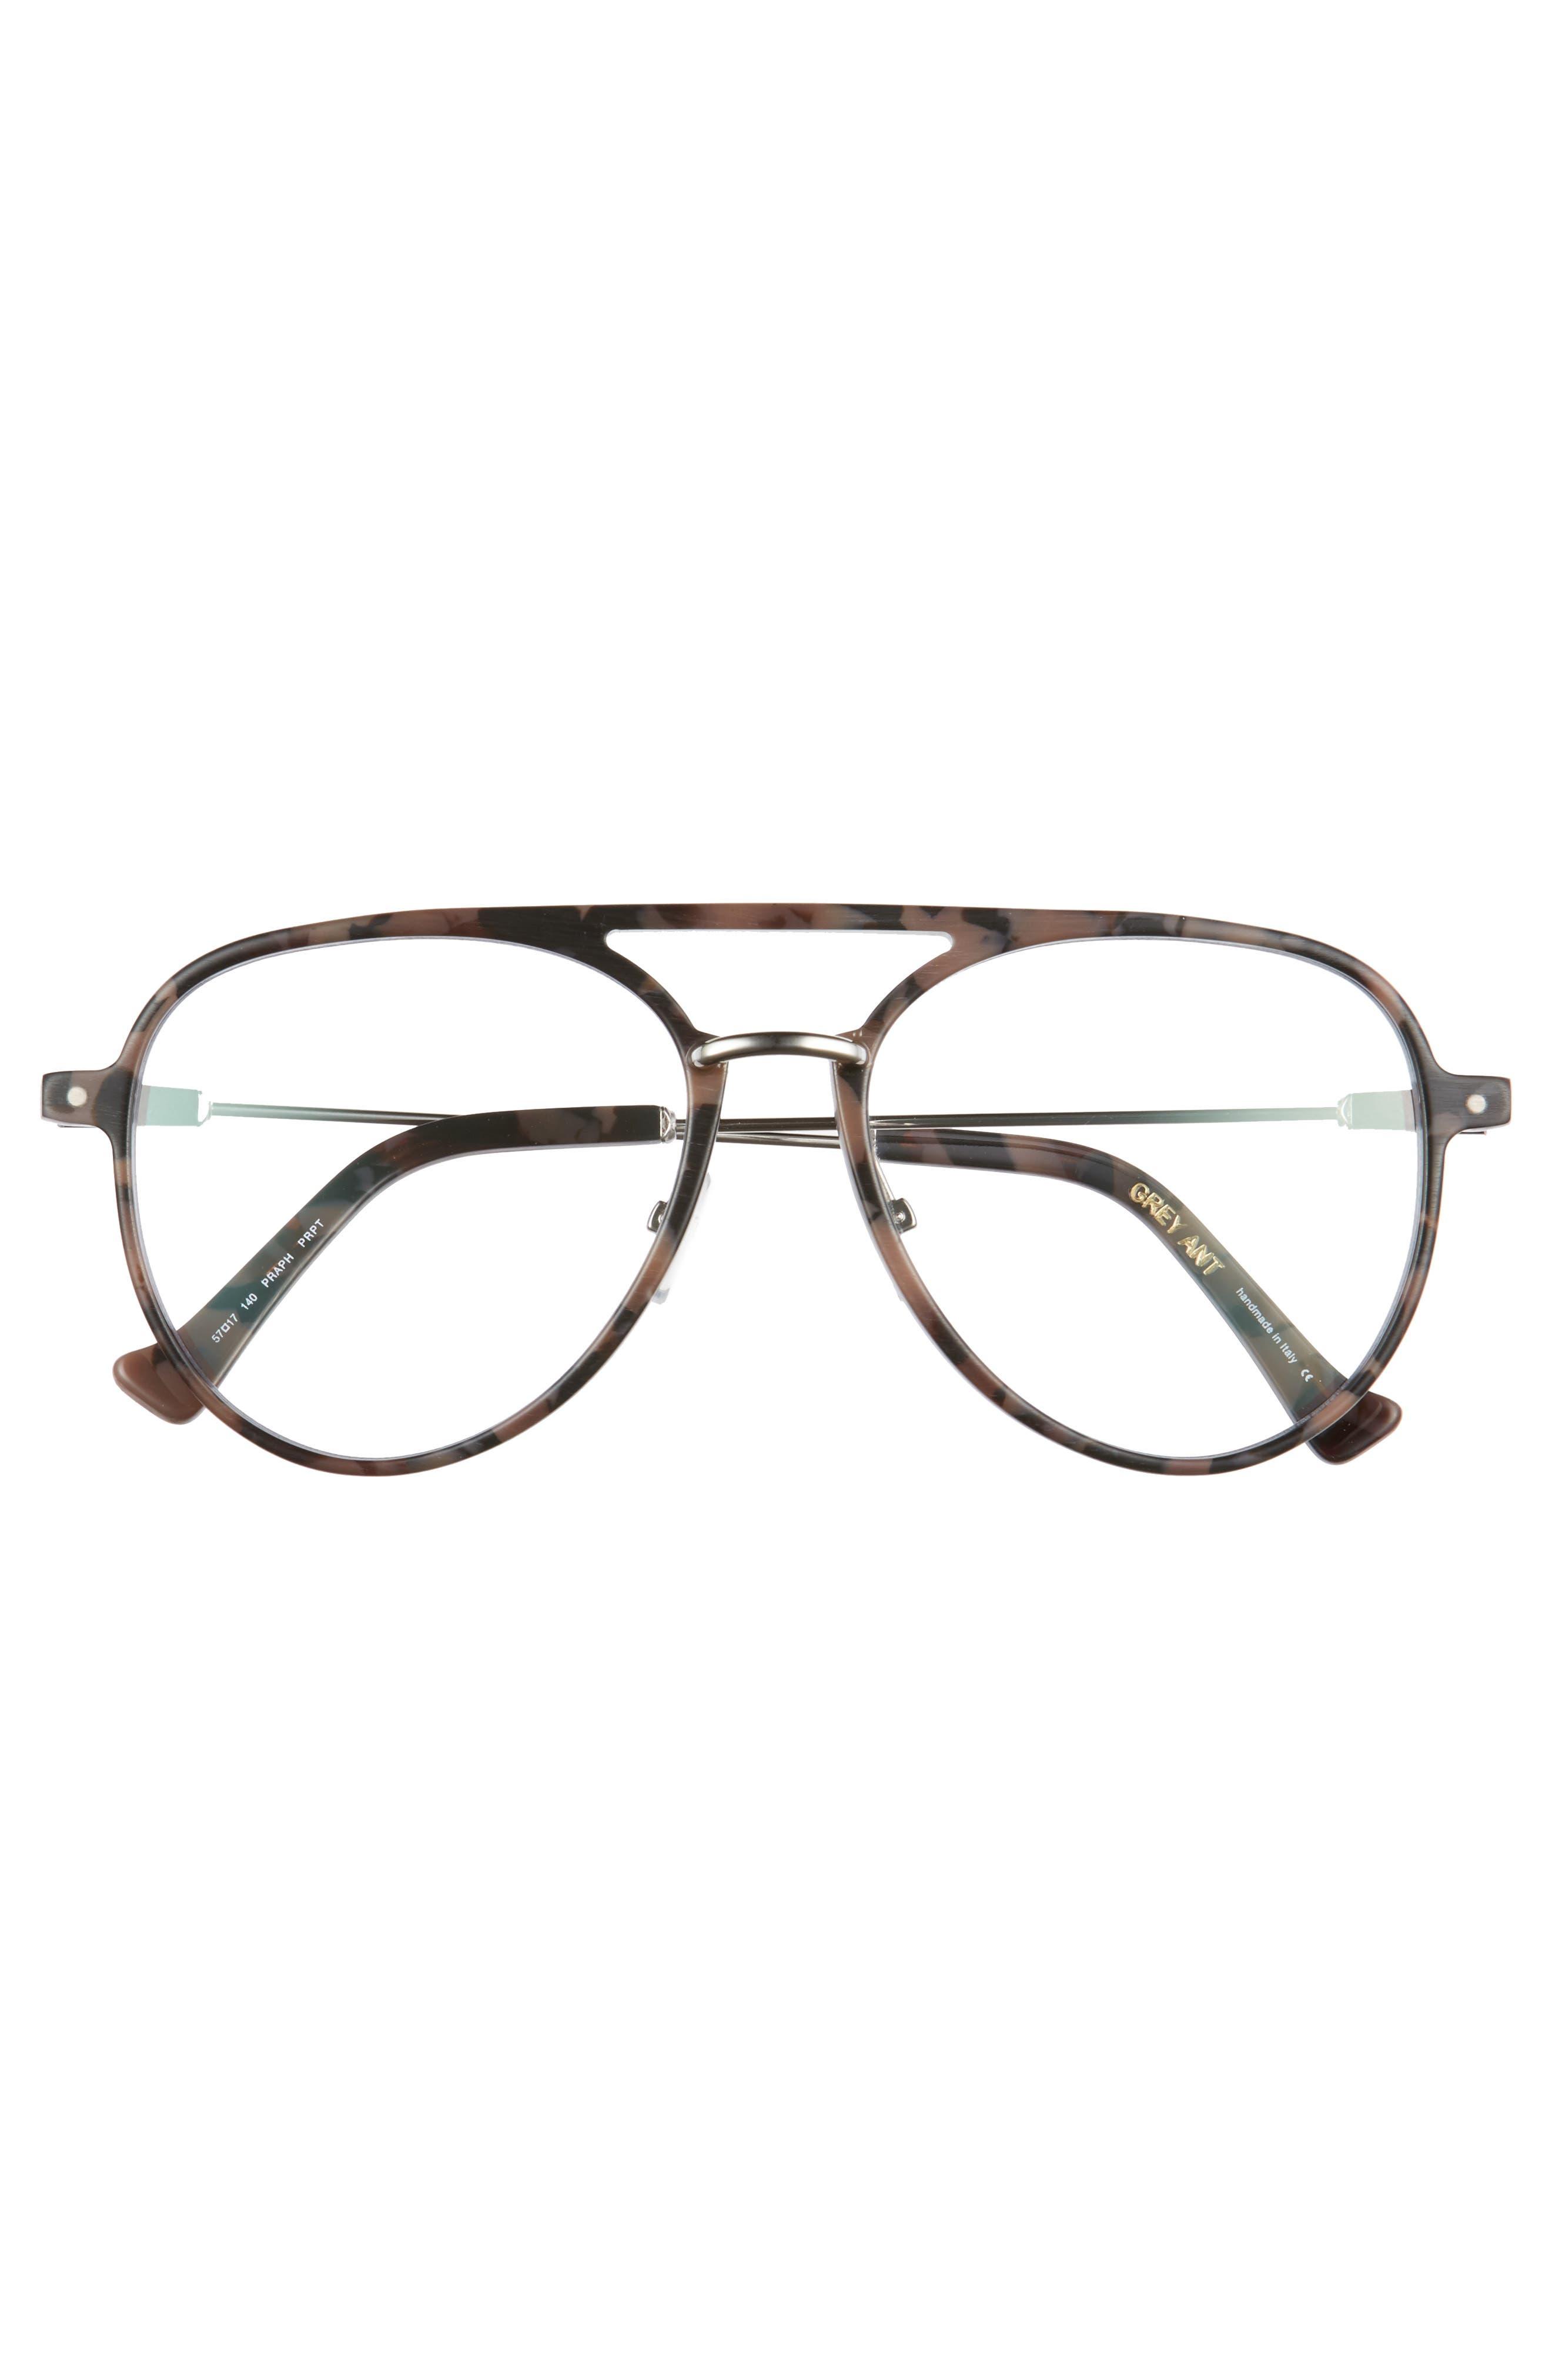 Praph 57mm Optical Glasses,                             Alternate thumbnail 3, color,                             ROSE TORTOISE/ OPTICAL